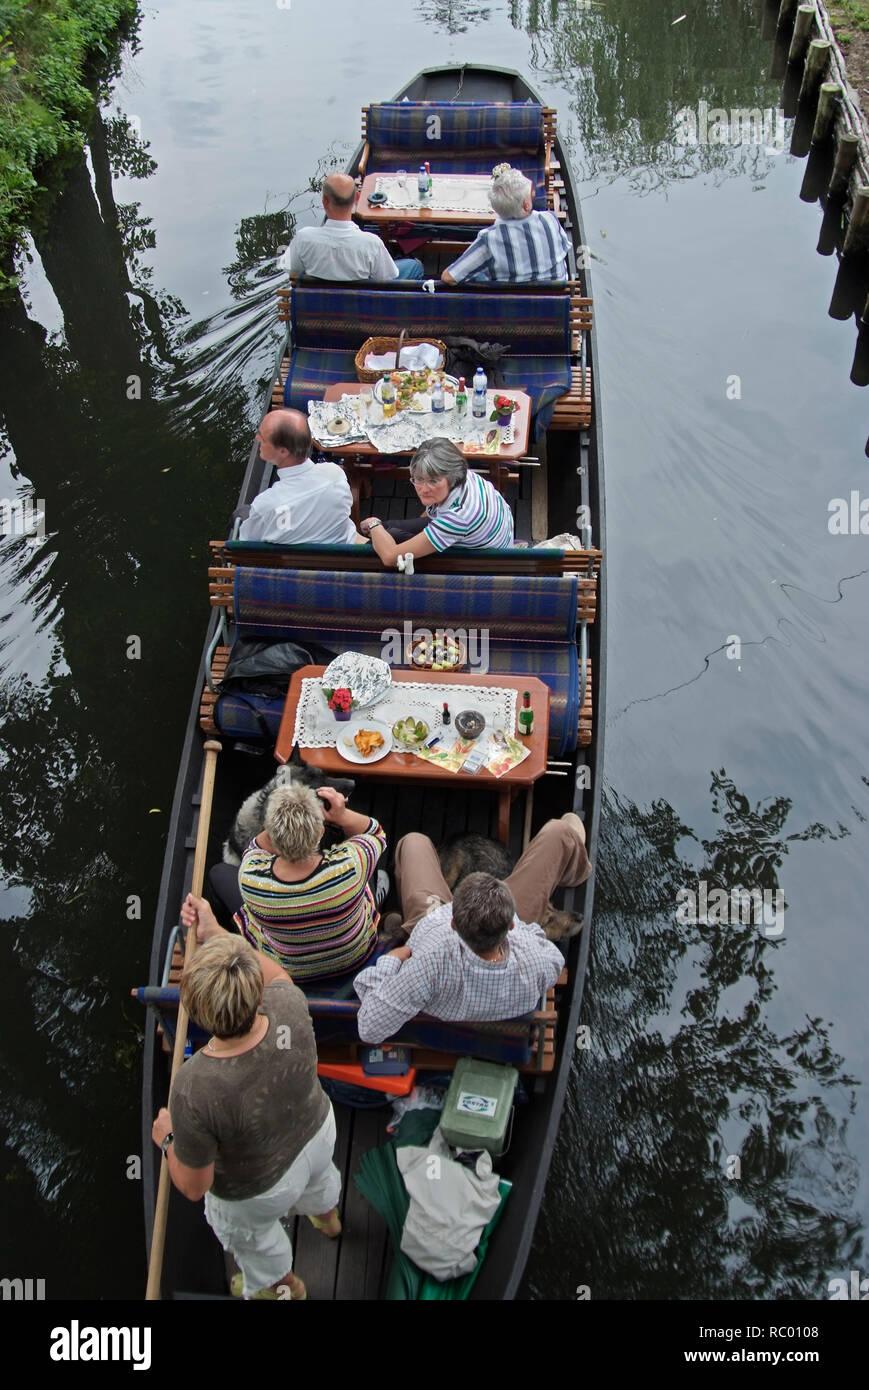 typischer Spreewaldkahn, Spreewald, Landkreis Oberspreewald-Lausitzkreis, Land Brandenburg, Deutschland, Europa | traditional Spreewald ship, Spreewal - Stock Image